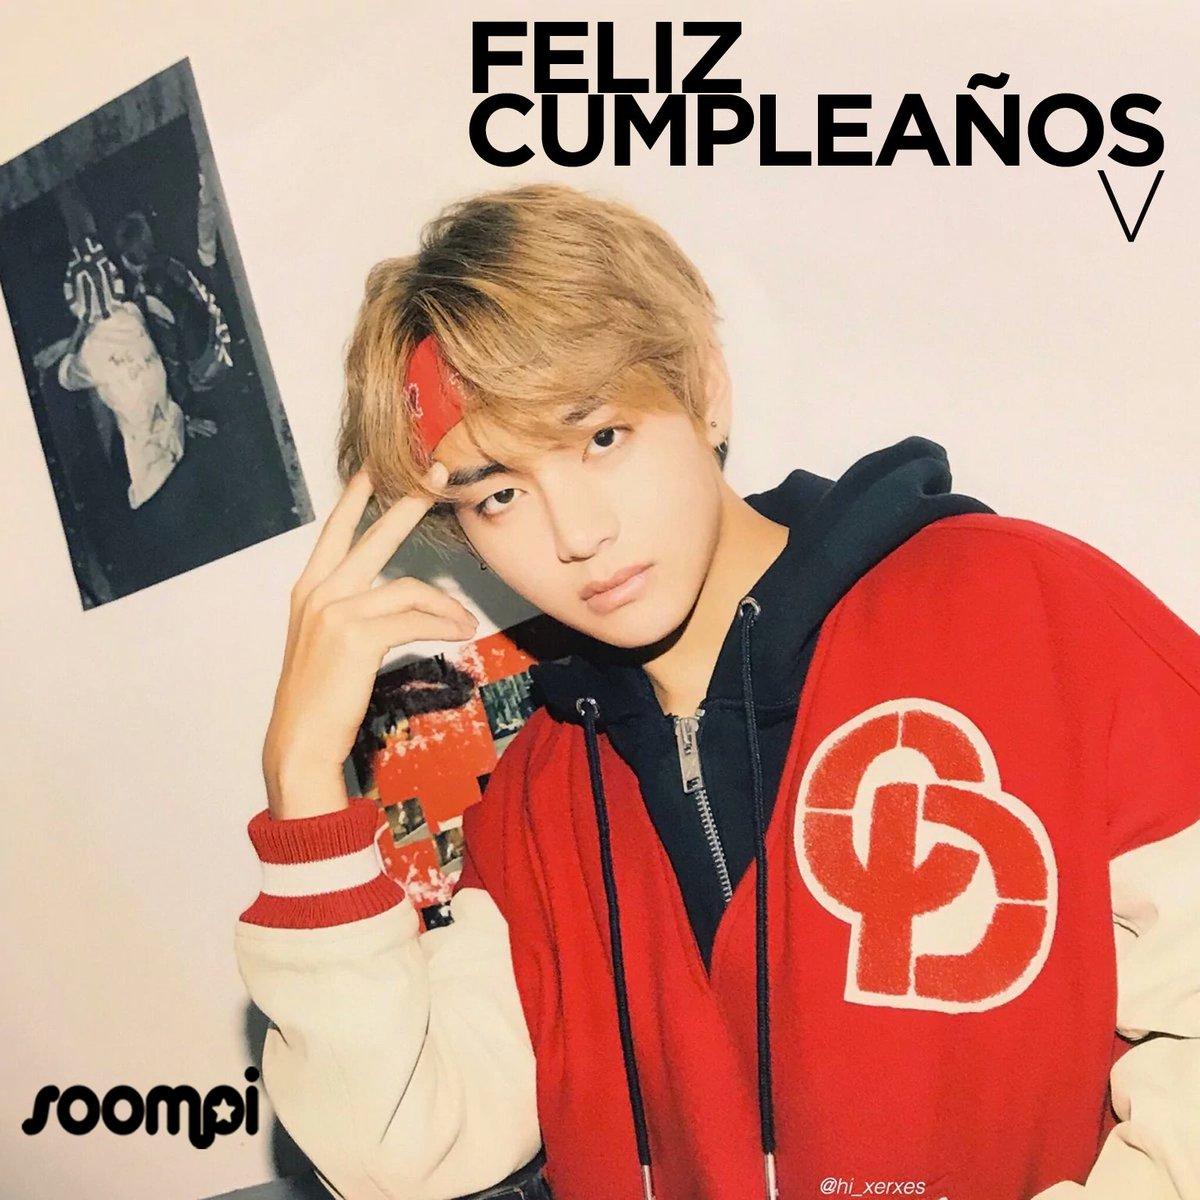 Soompi Spanish På Twitter Feliz Cumpleaños A V De Bts Happyvday Puedes Leer Más Noticias Sobre El Grupo Aquí Https T Co Ussxeij0wq